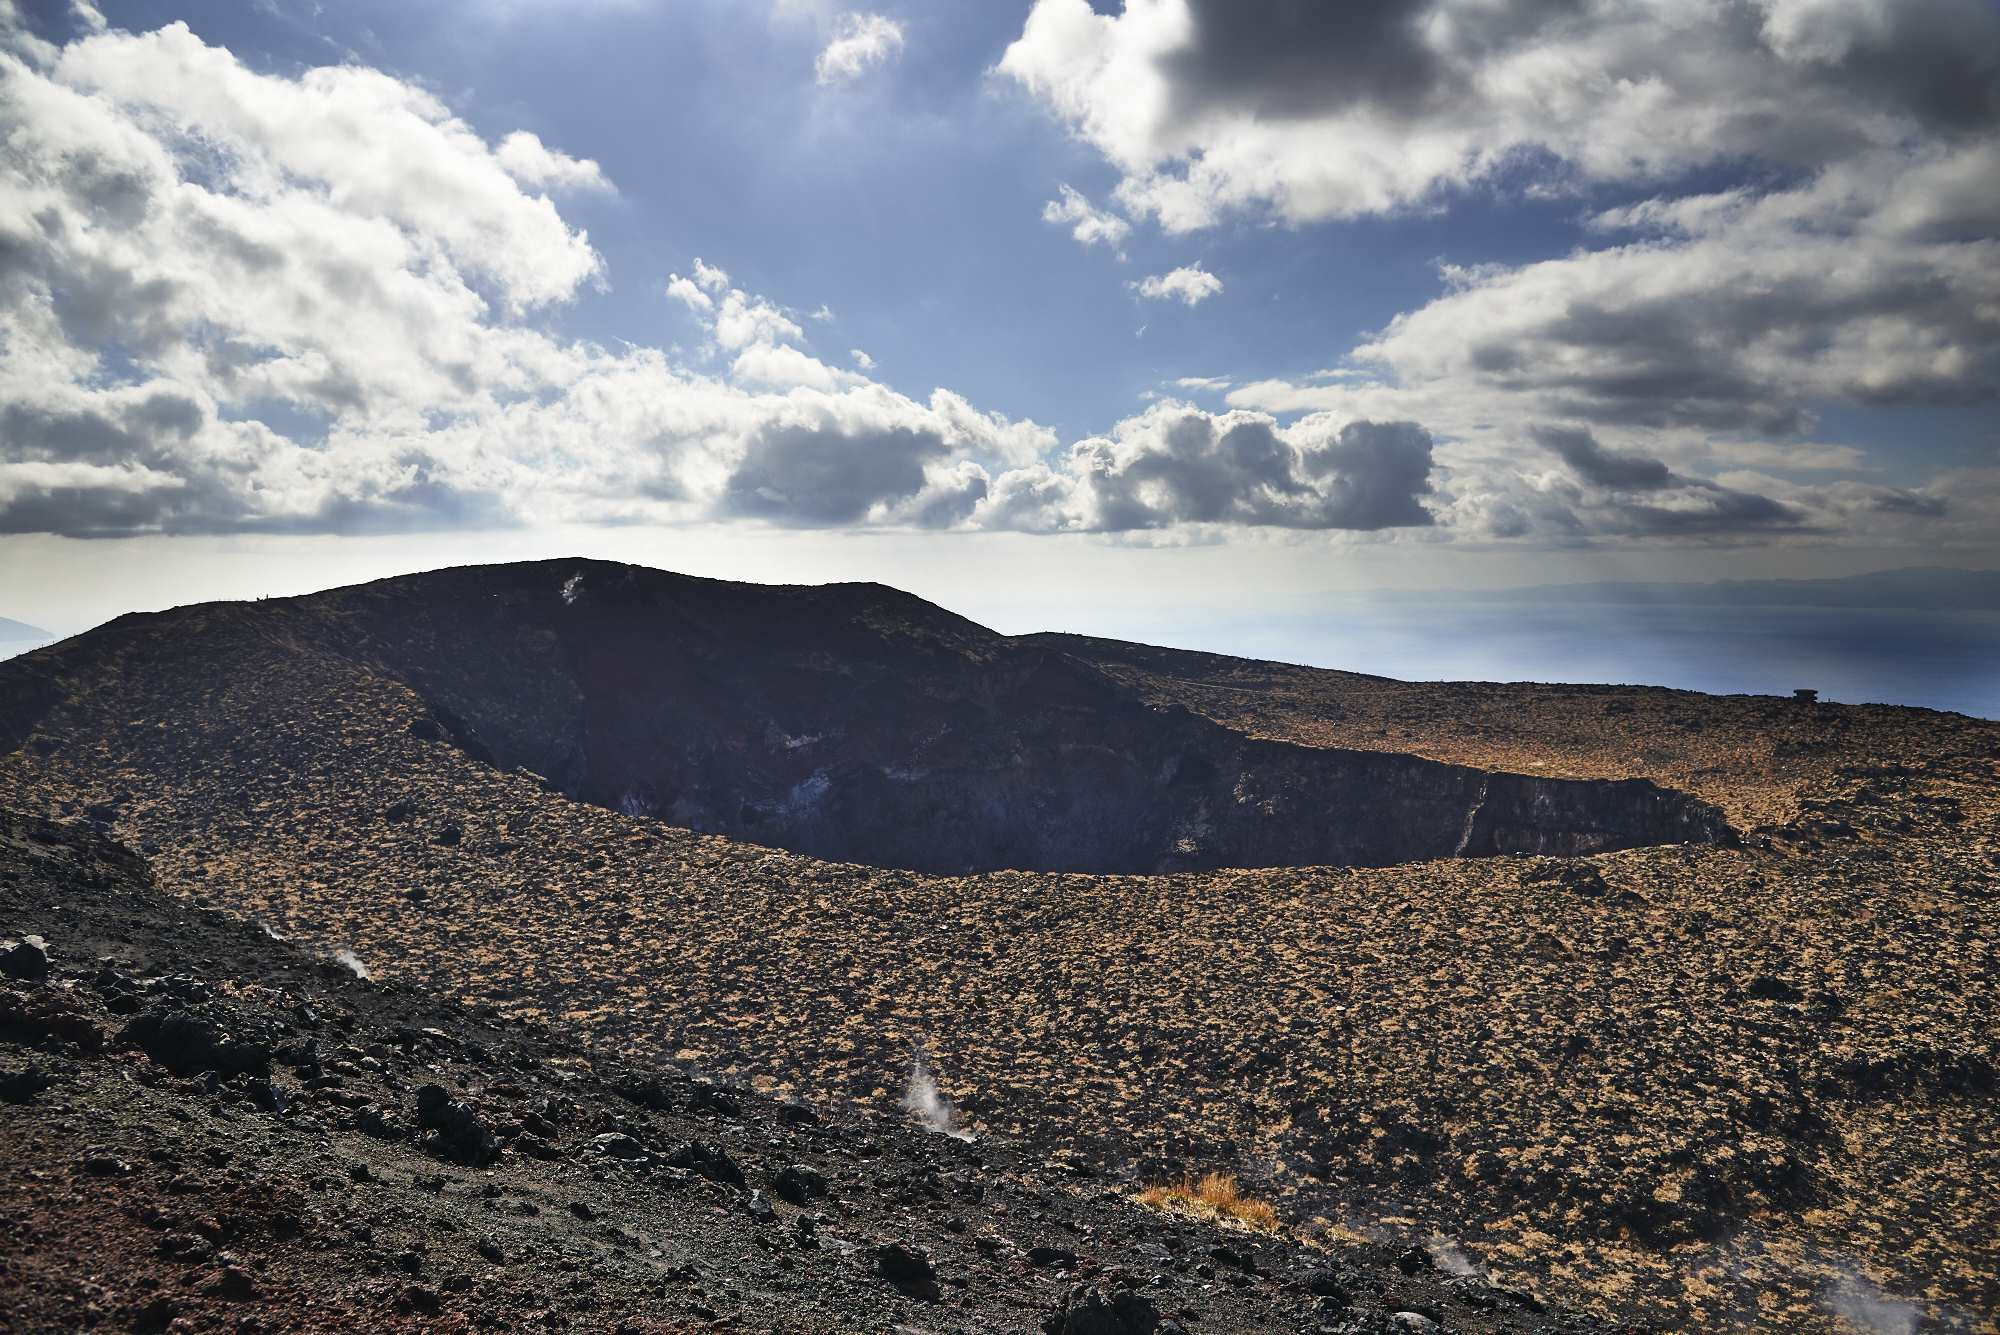 伊豆大島三原山の噴火口